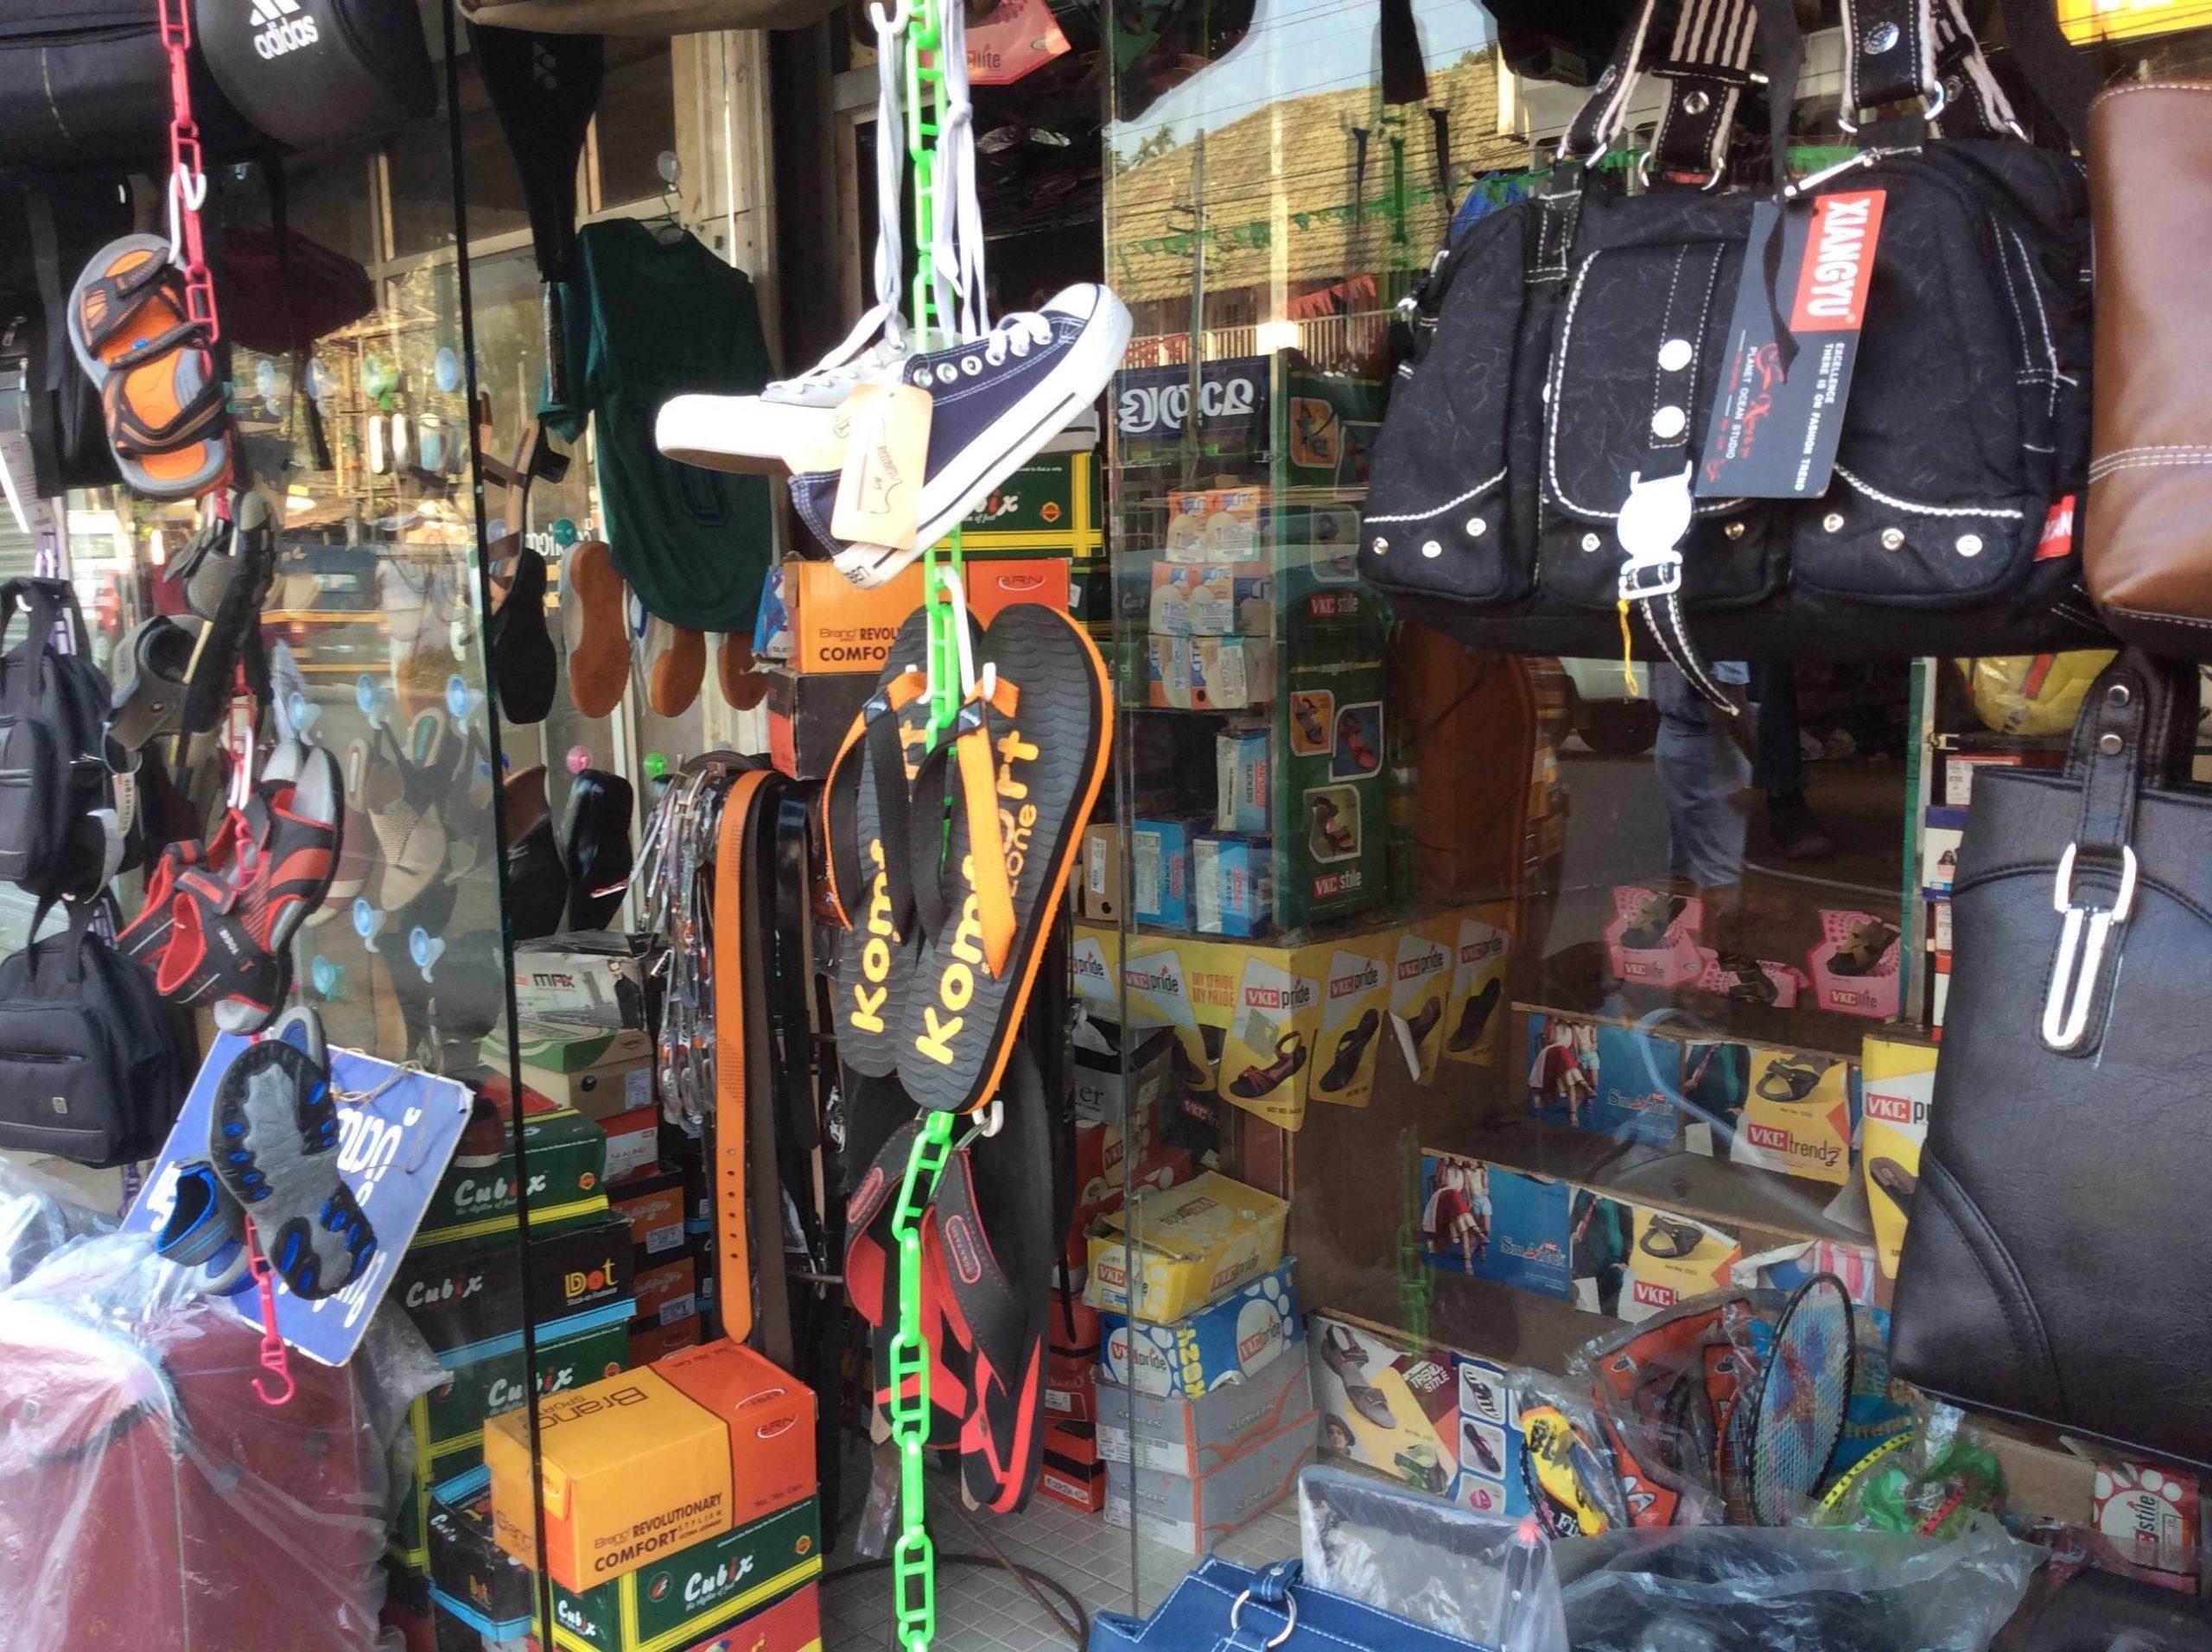 Easwaran Nanmboodiri - Shopping Destination in Wayanad